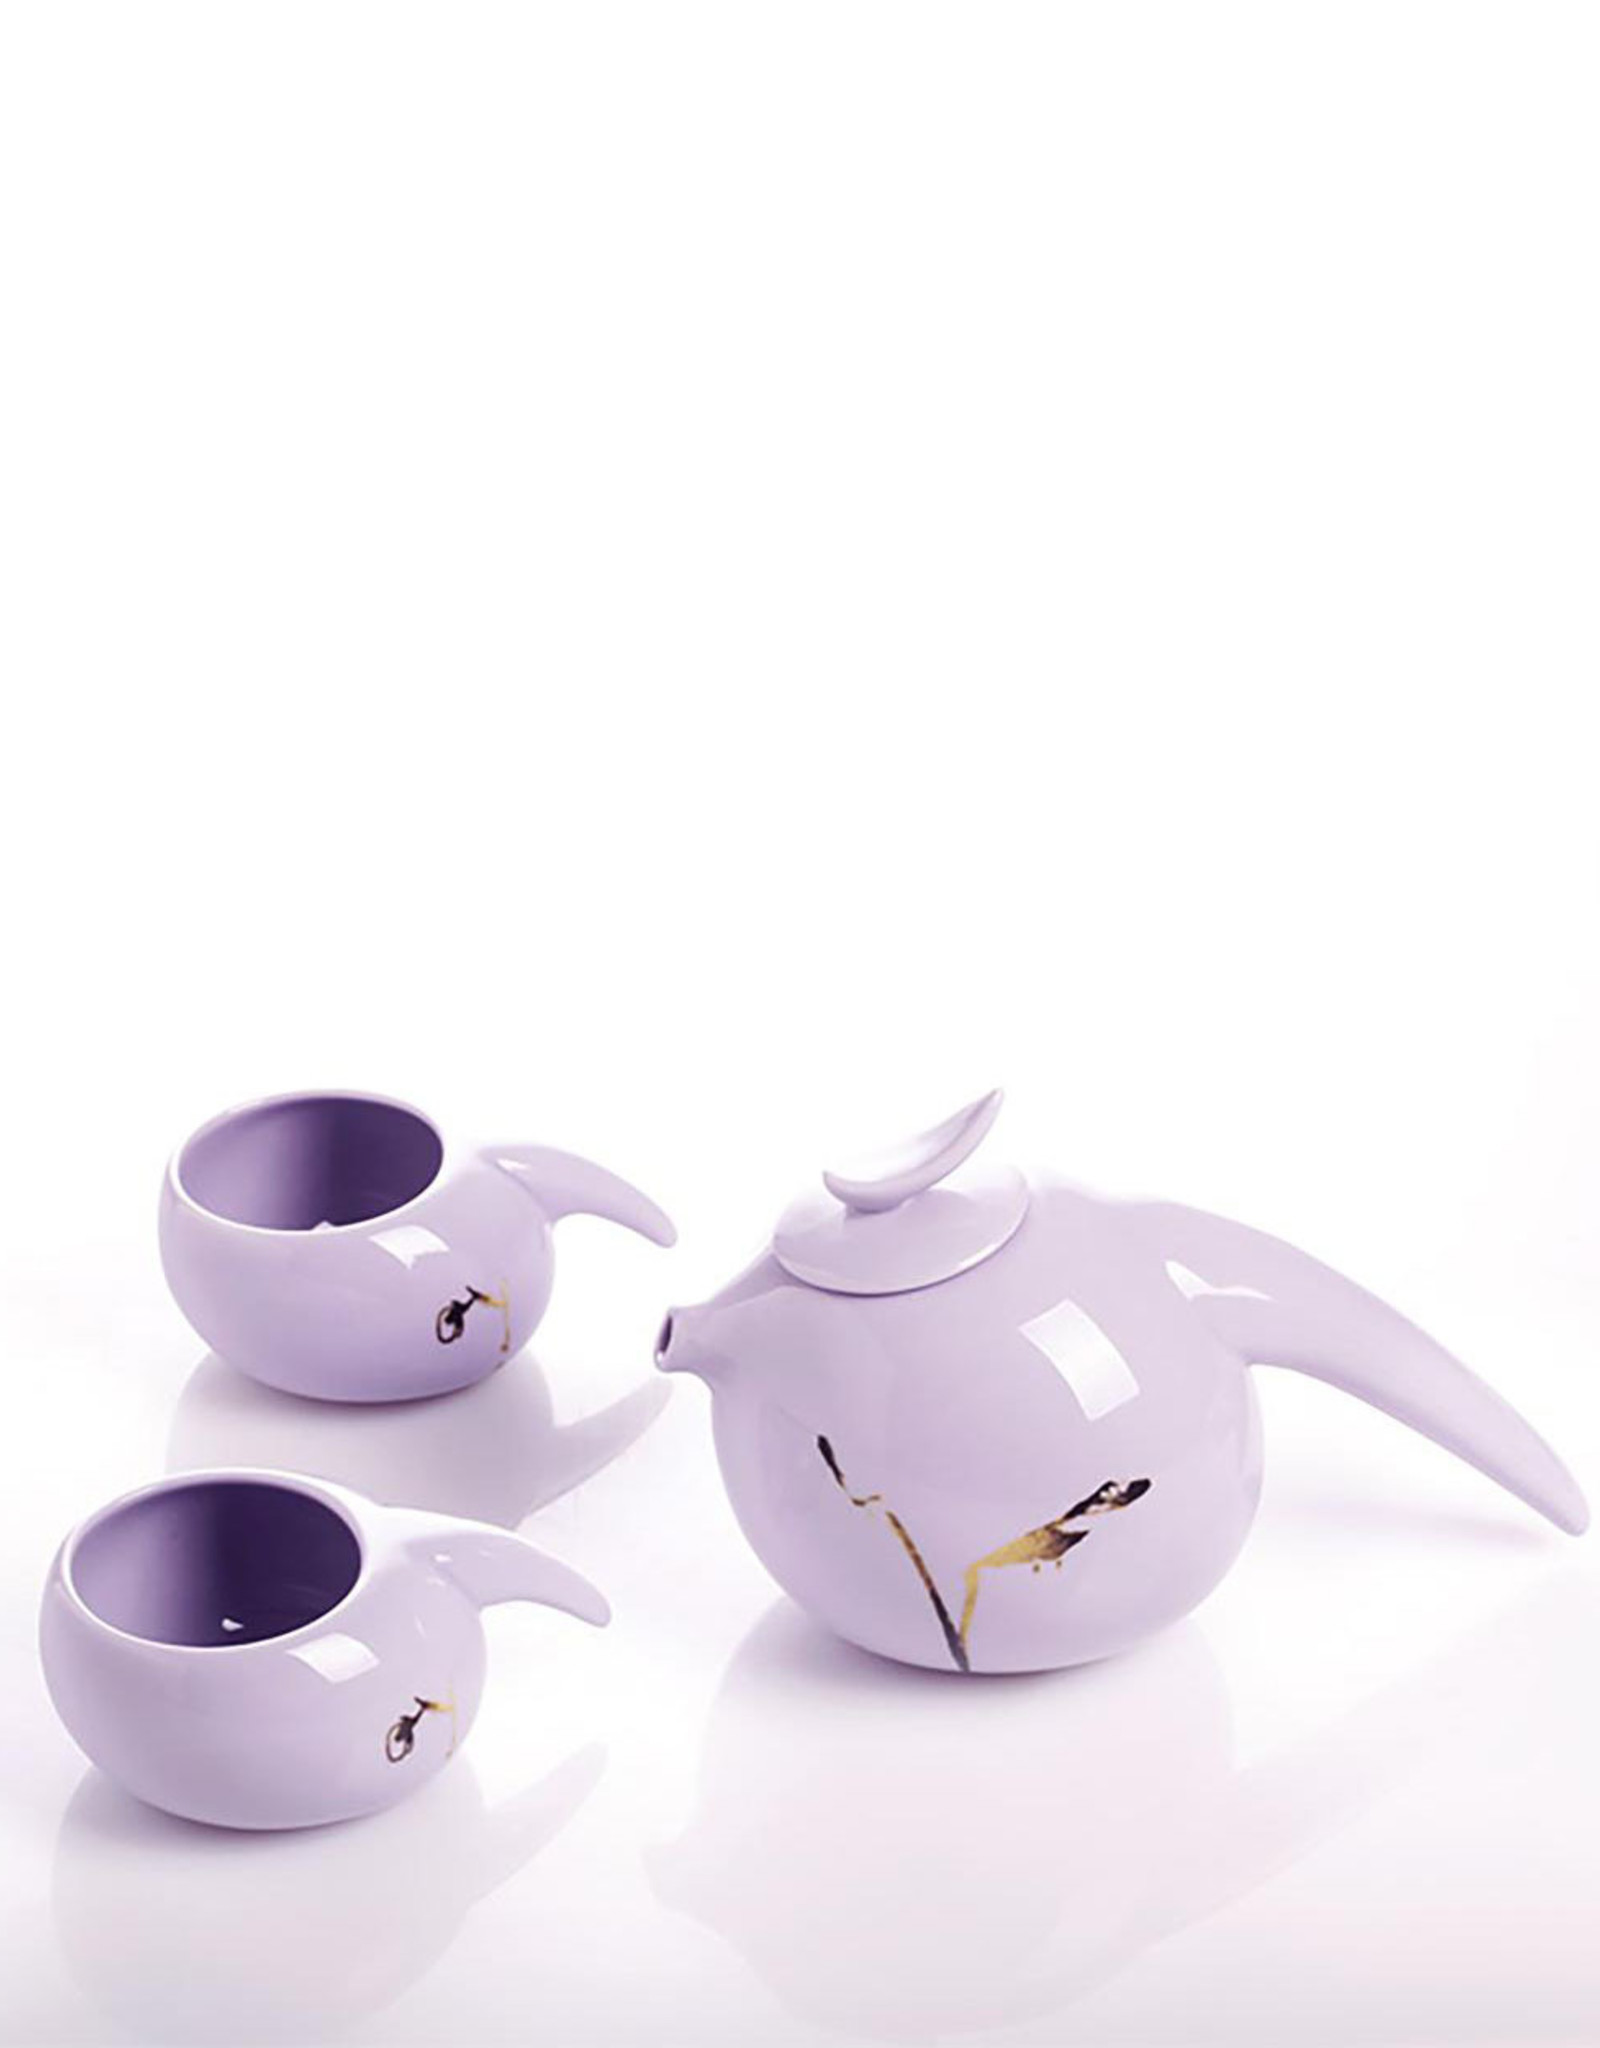 "LIULI Crystal Art Bone China Tea Set, ""Robin, Herald of the Dawn"" (1 Teapot, 4 Teacups) Limited Edition"